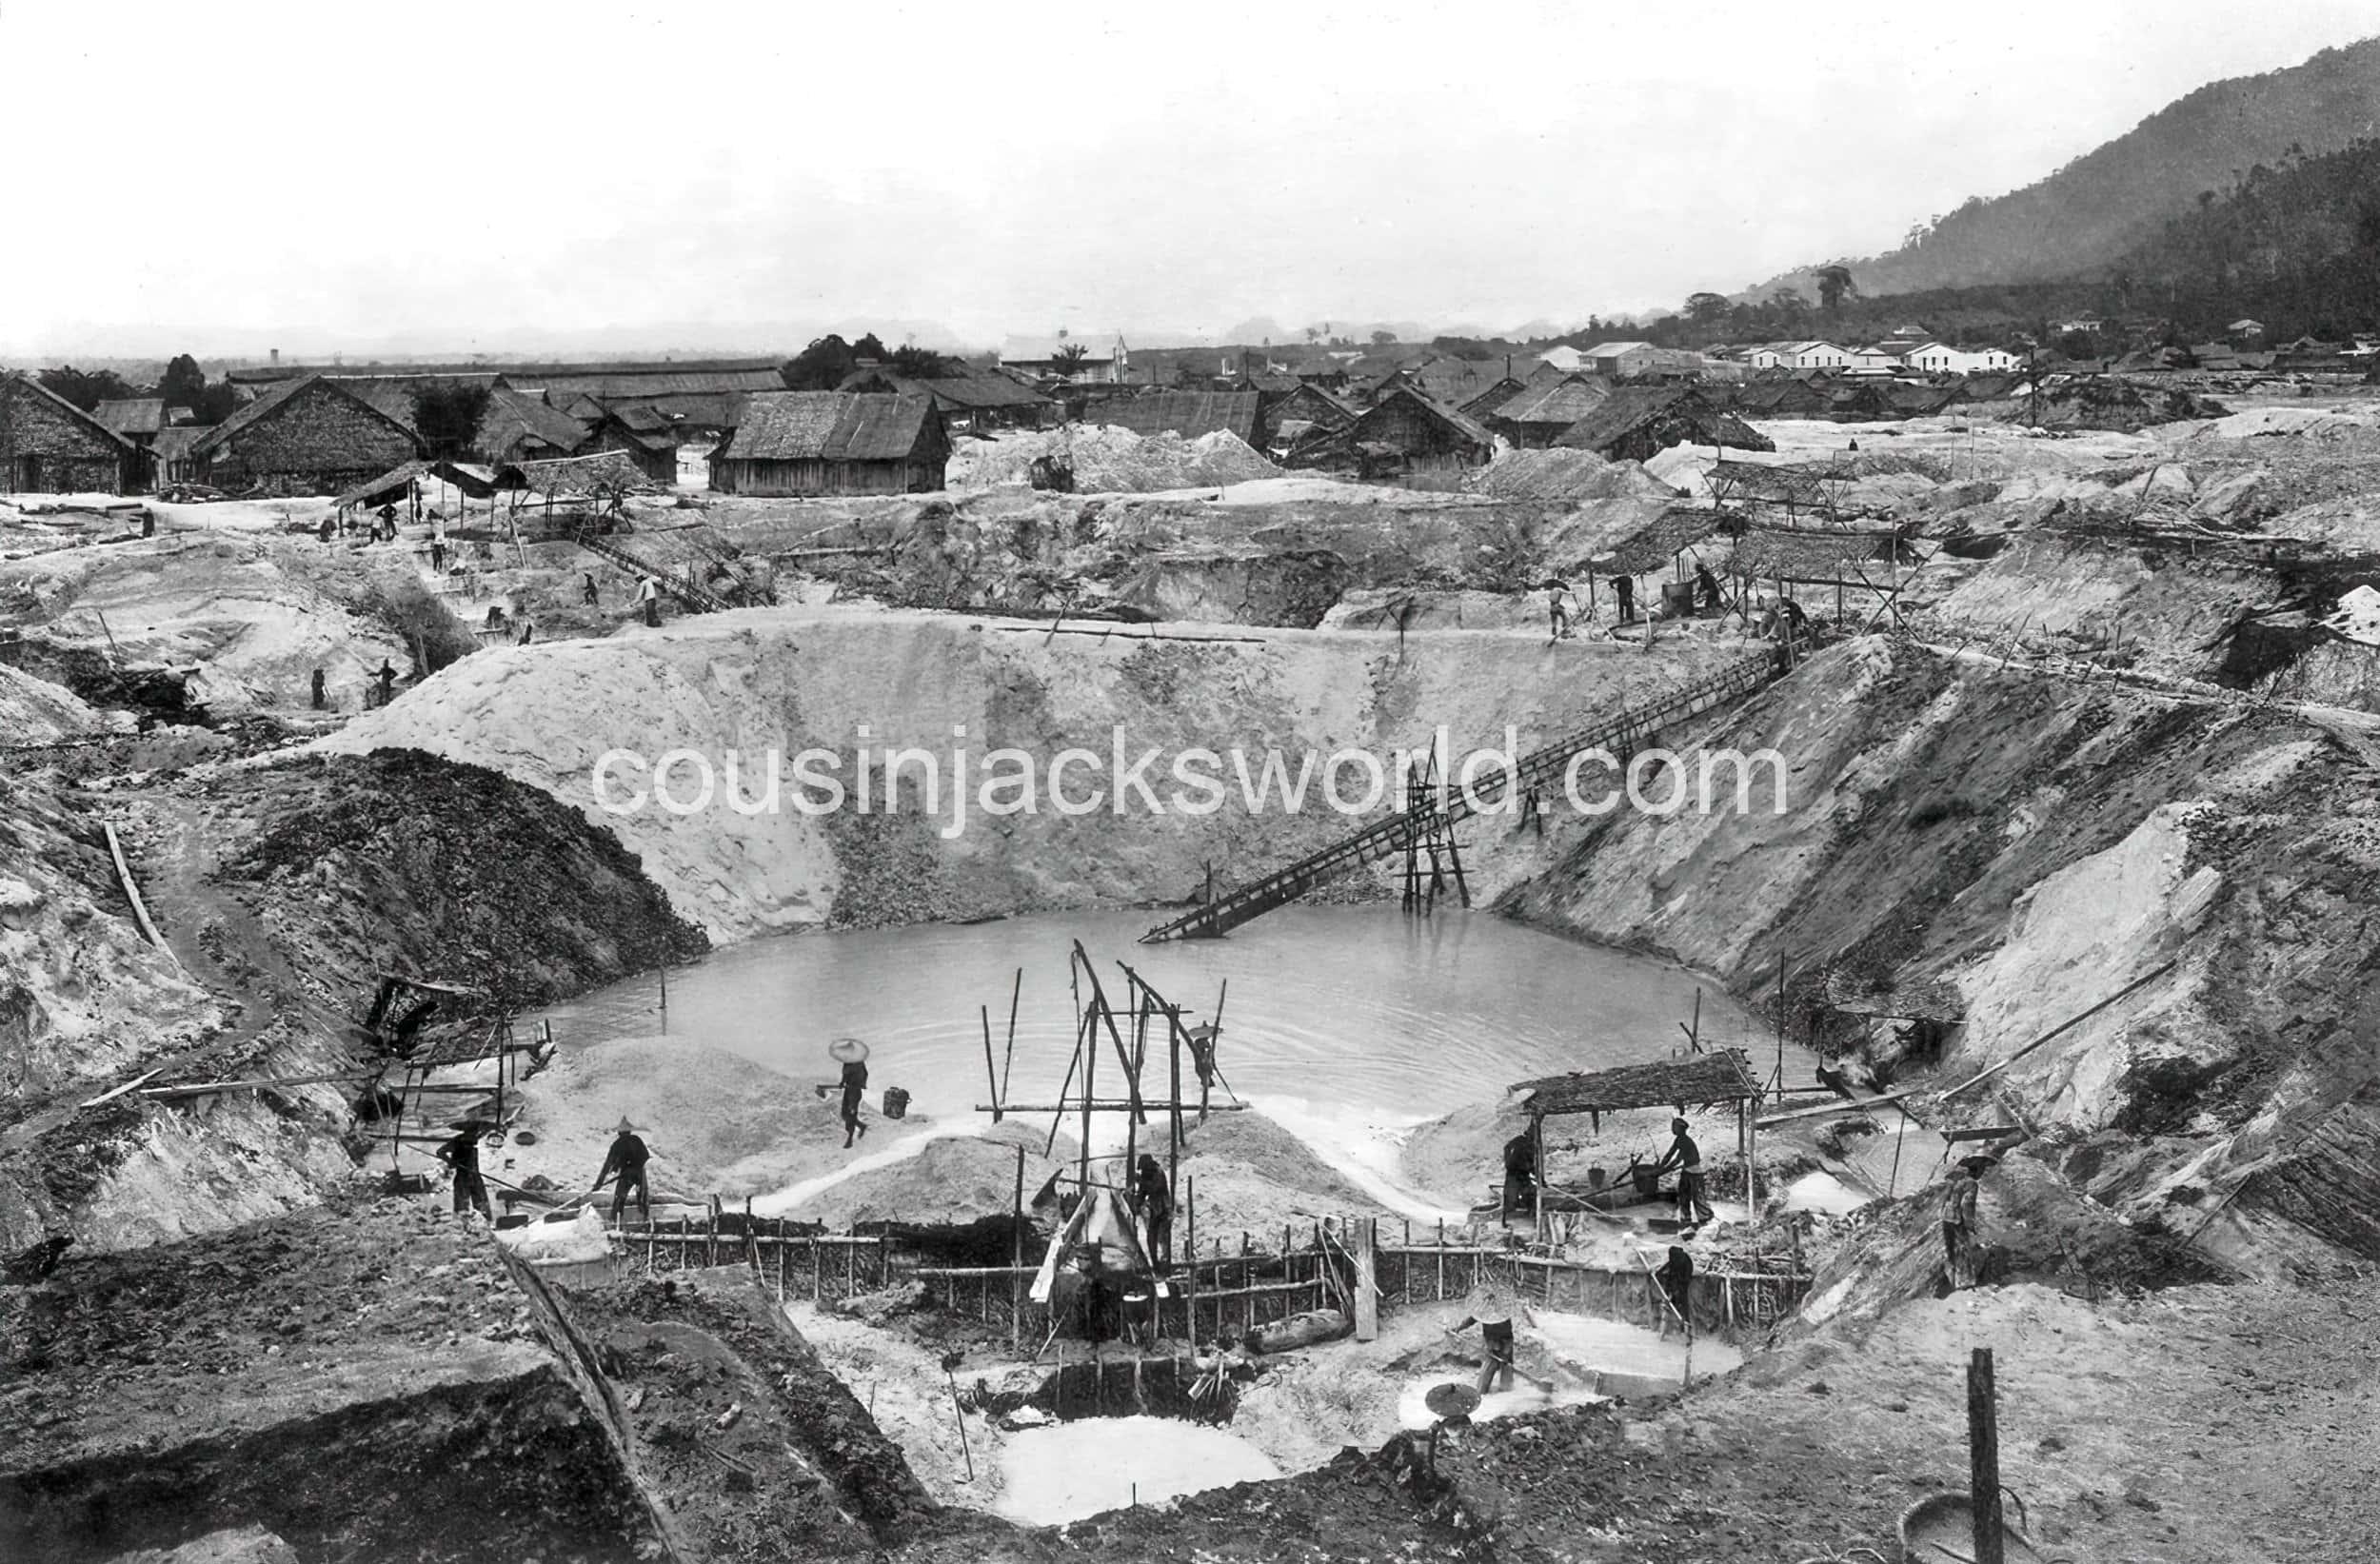 Opencast tin mine, Ipoh, Malaya. The demise of Cornish mining migration